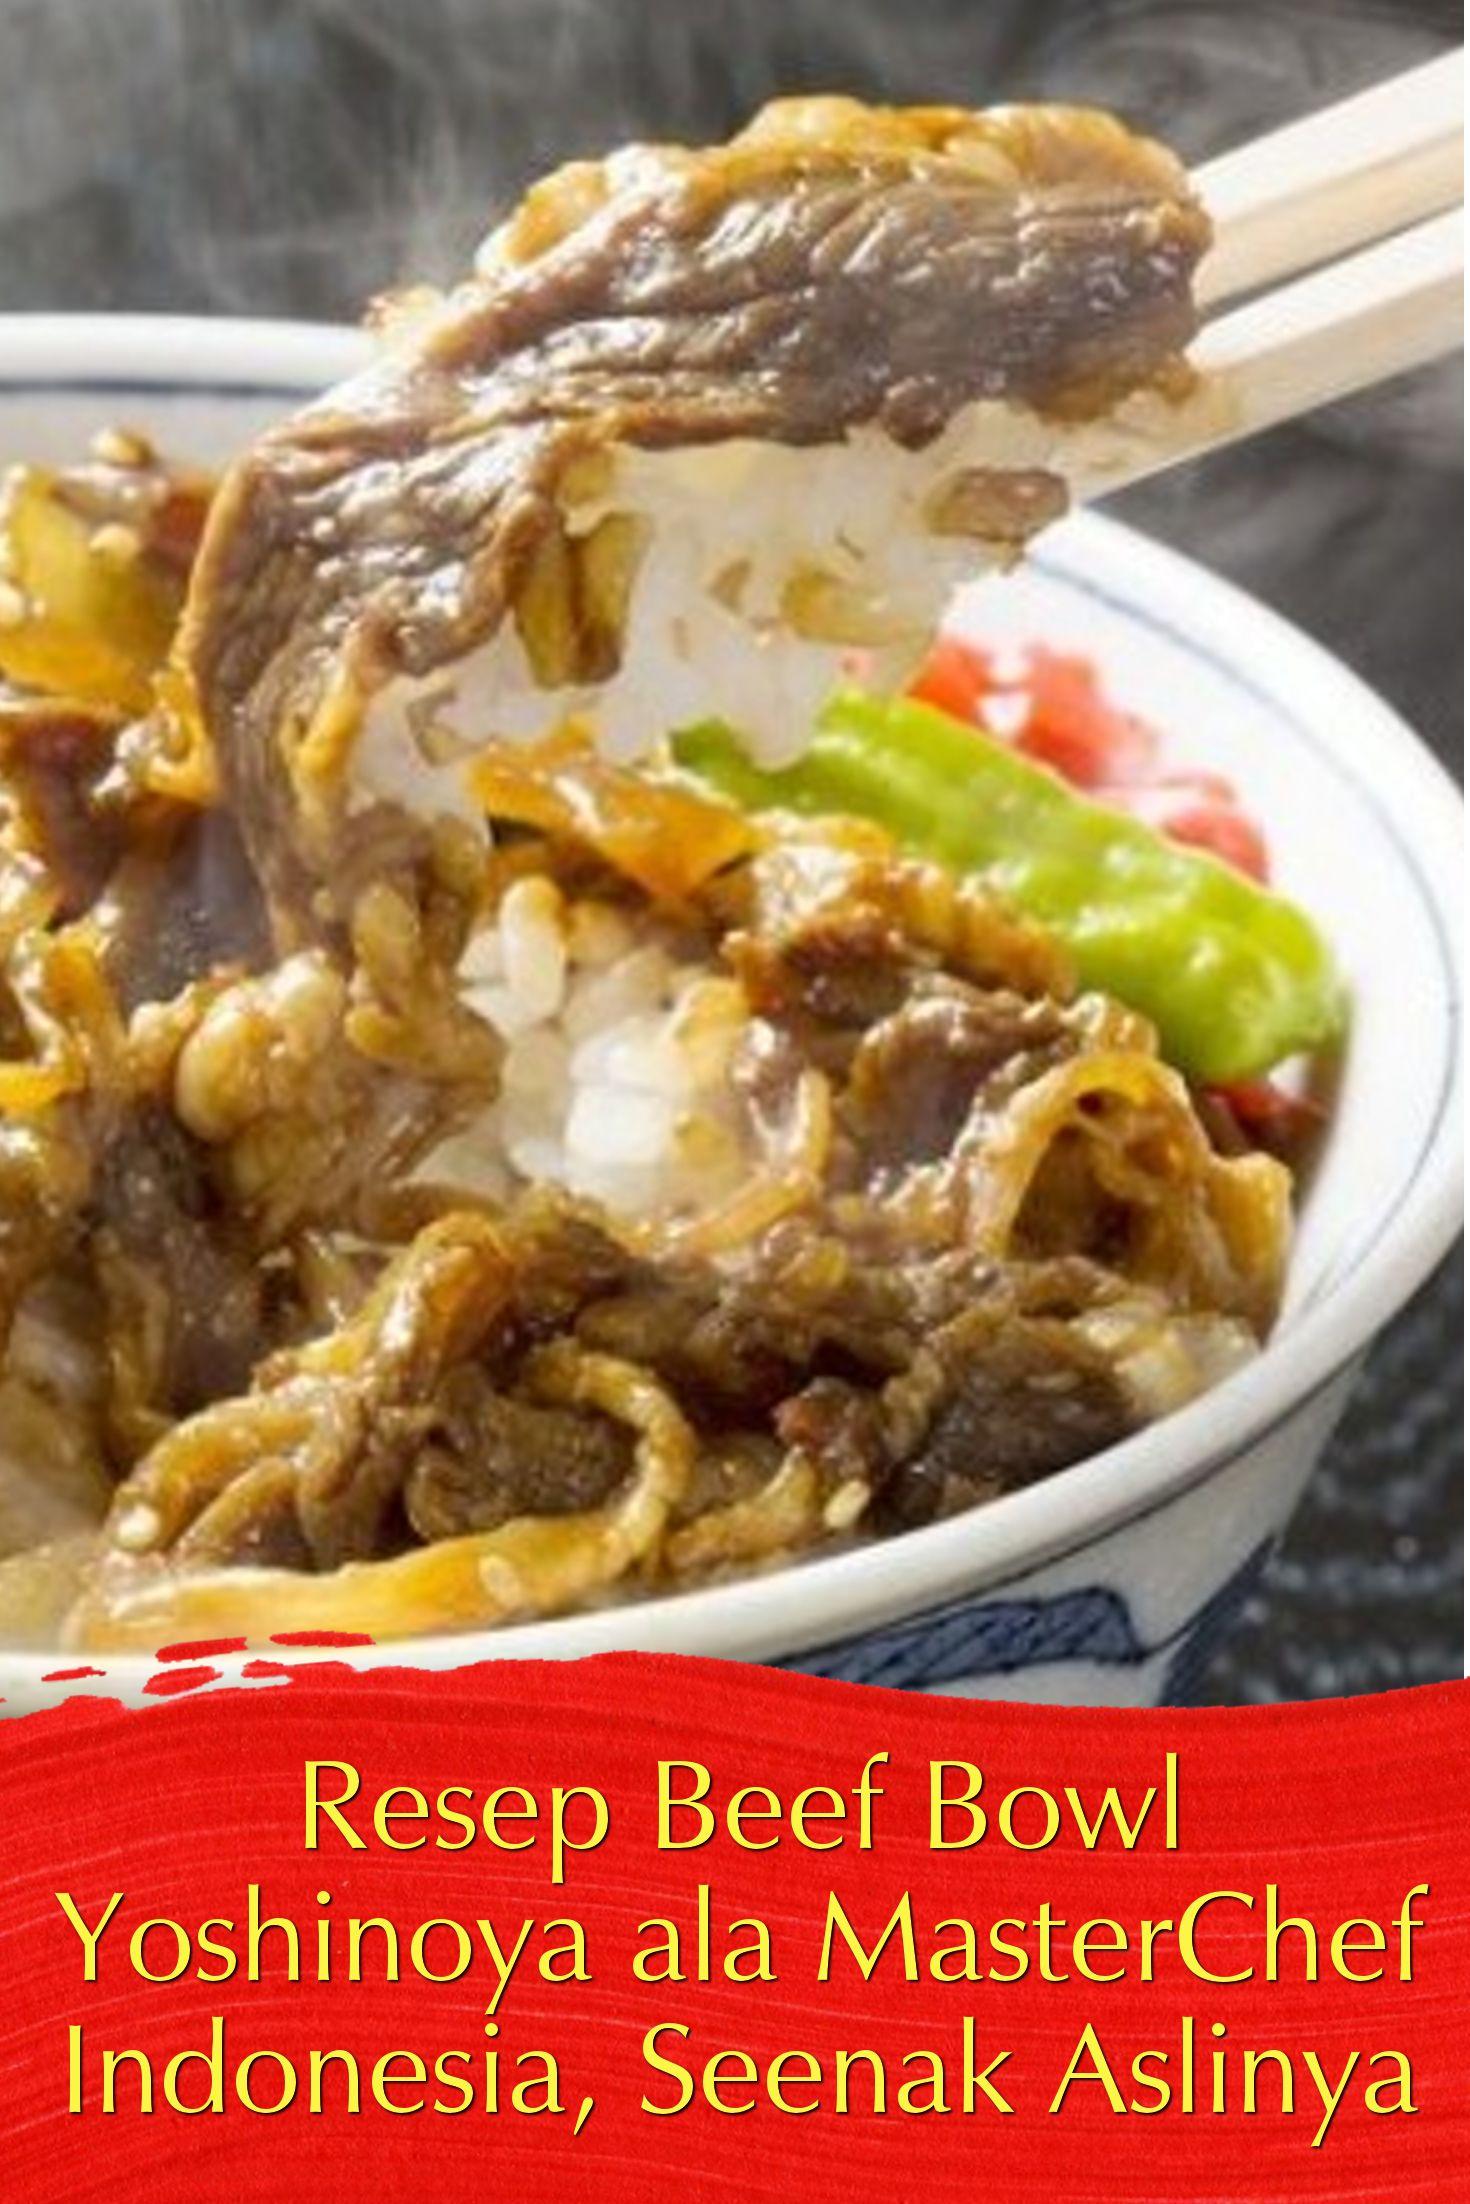 Resep Beef Bowl Yoshinoya Resep